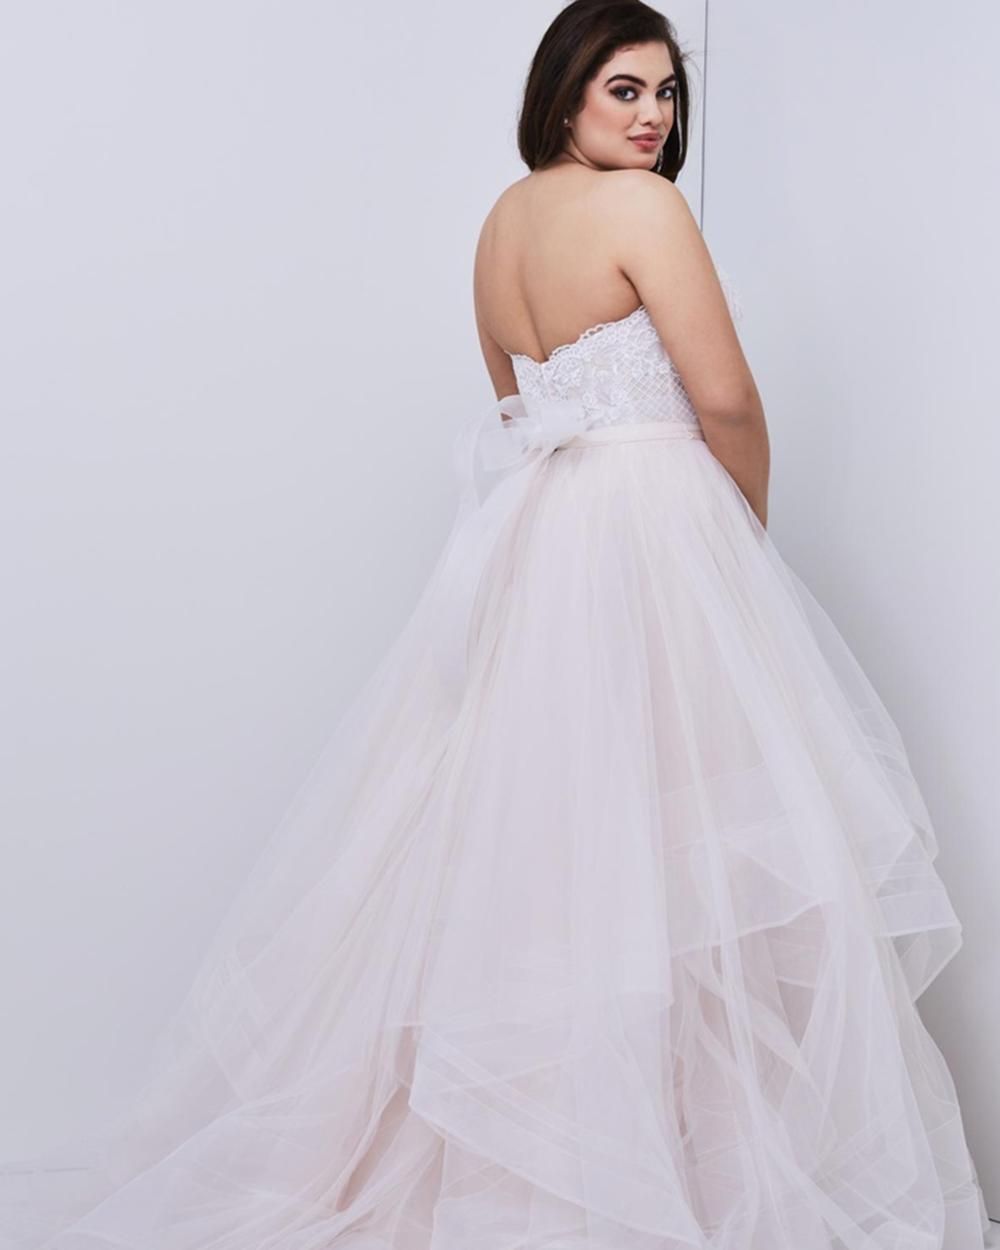 plus-size-wedding-dresses-wtoo-j-andrews.png